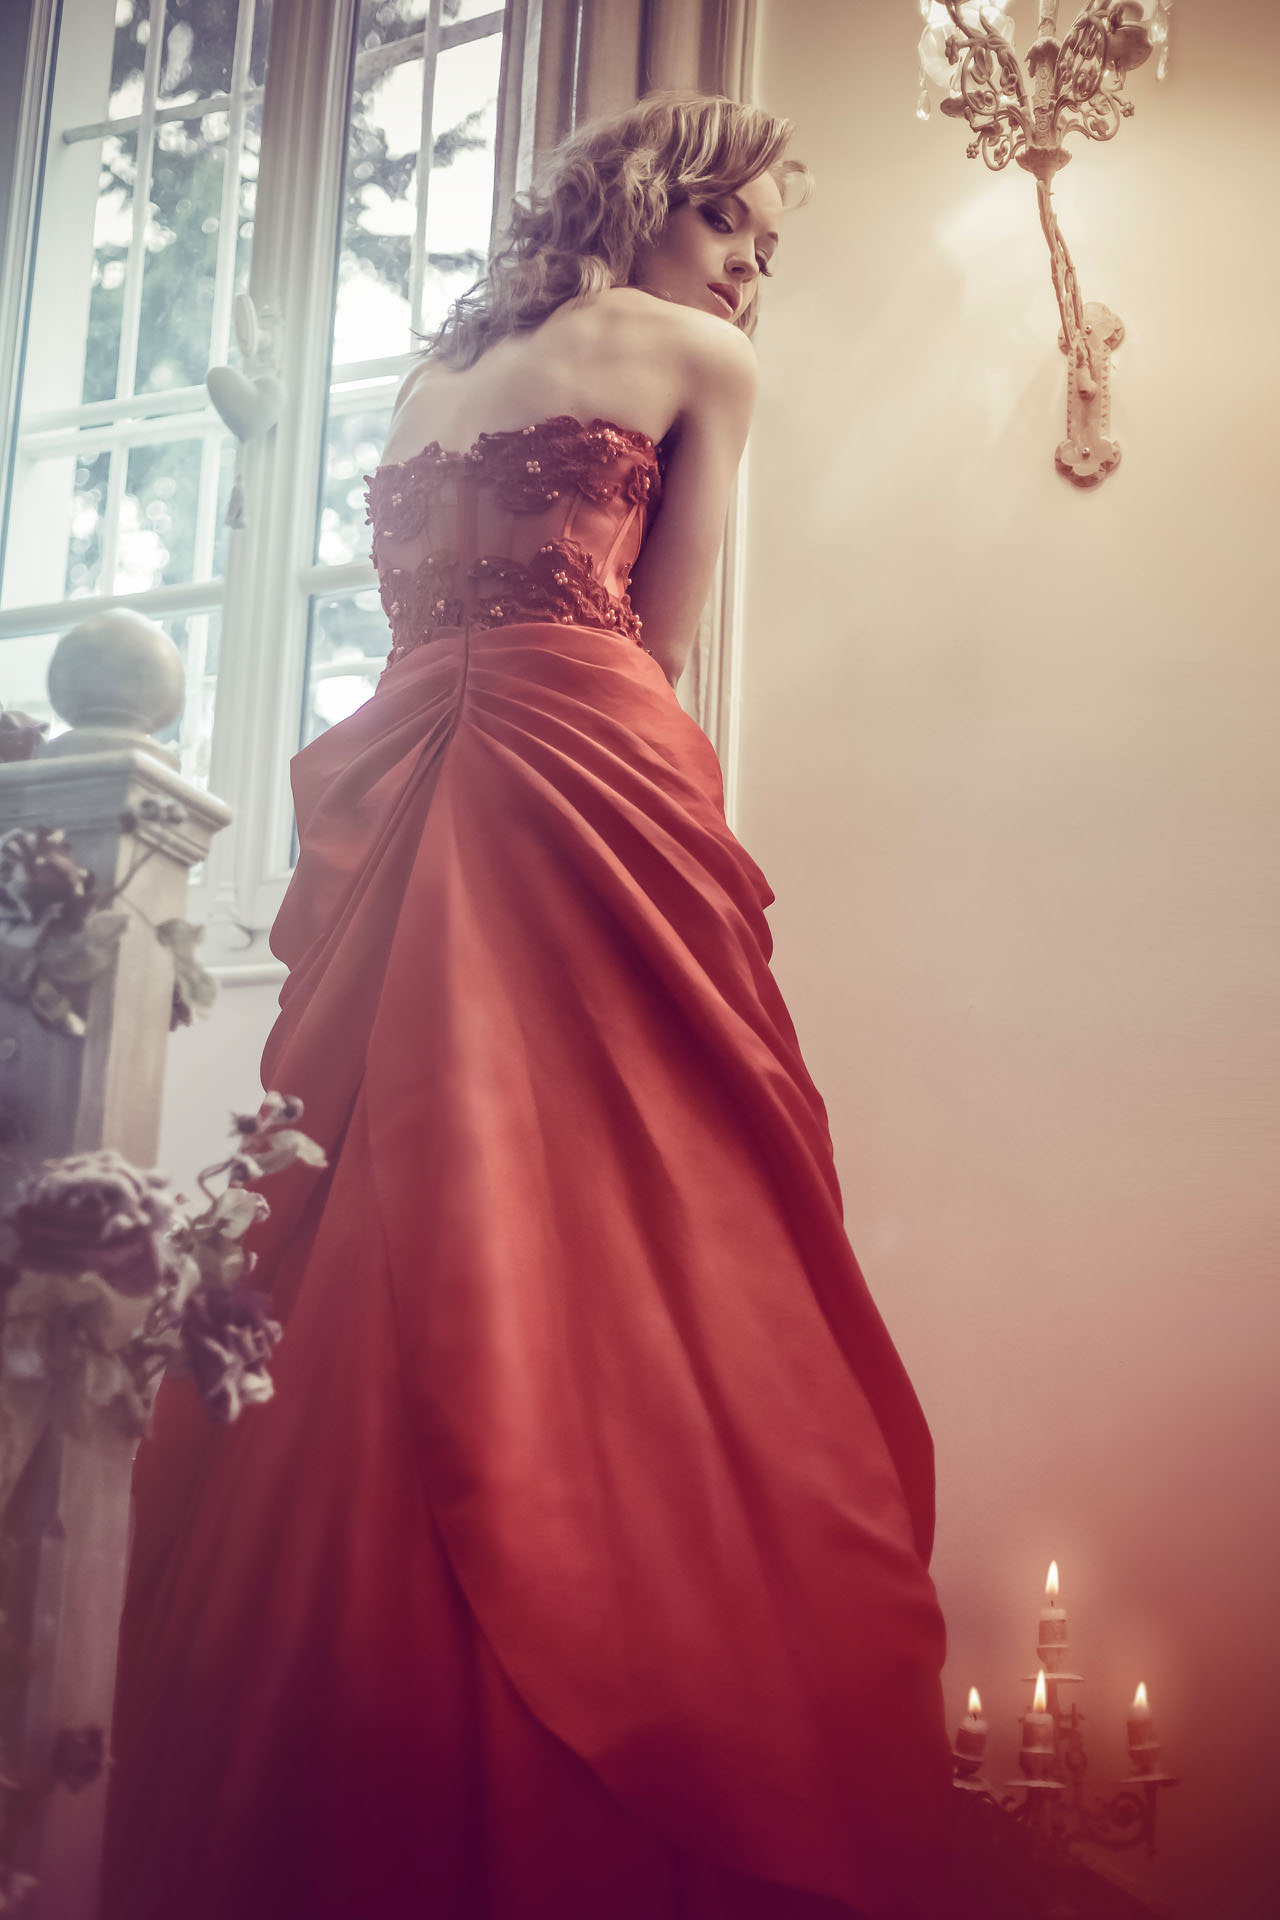 2015-01-19 - Vanessa - Maison Boudoir - 2602 - 1920px